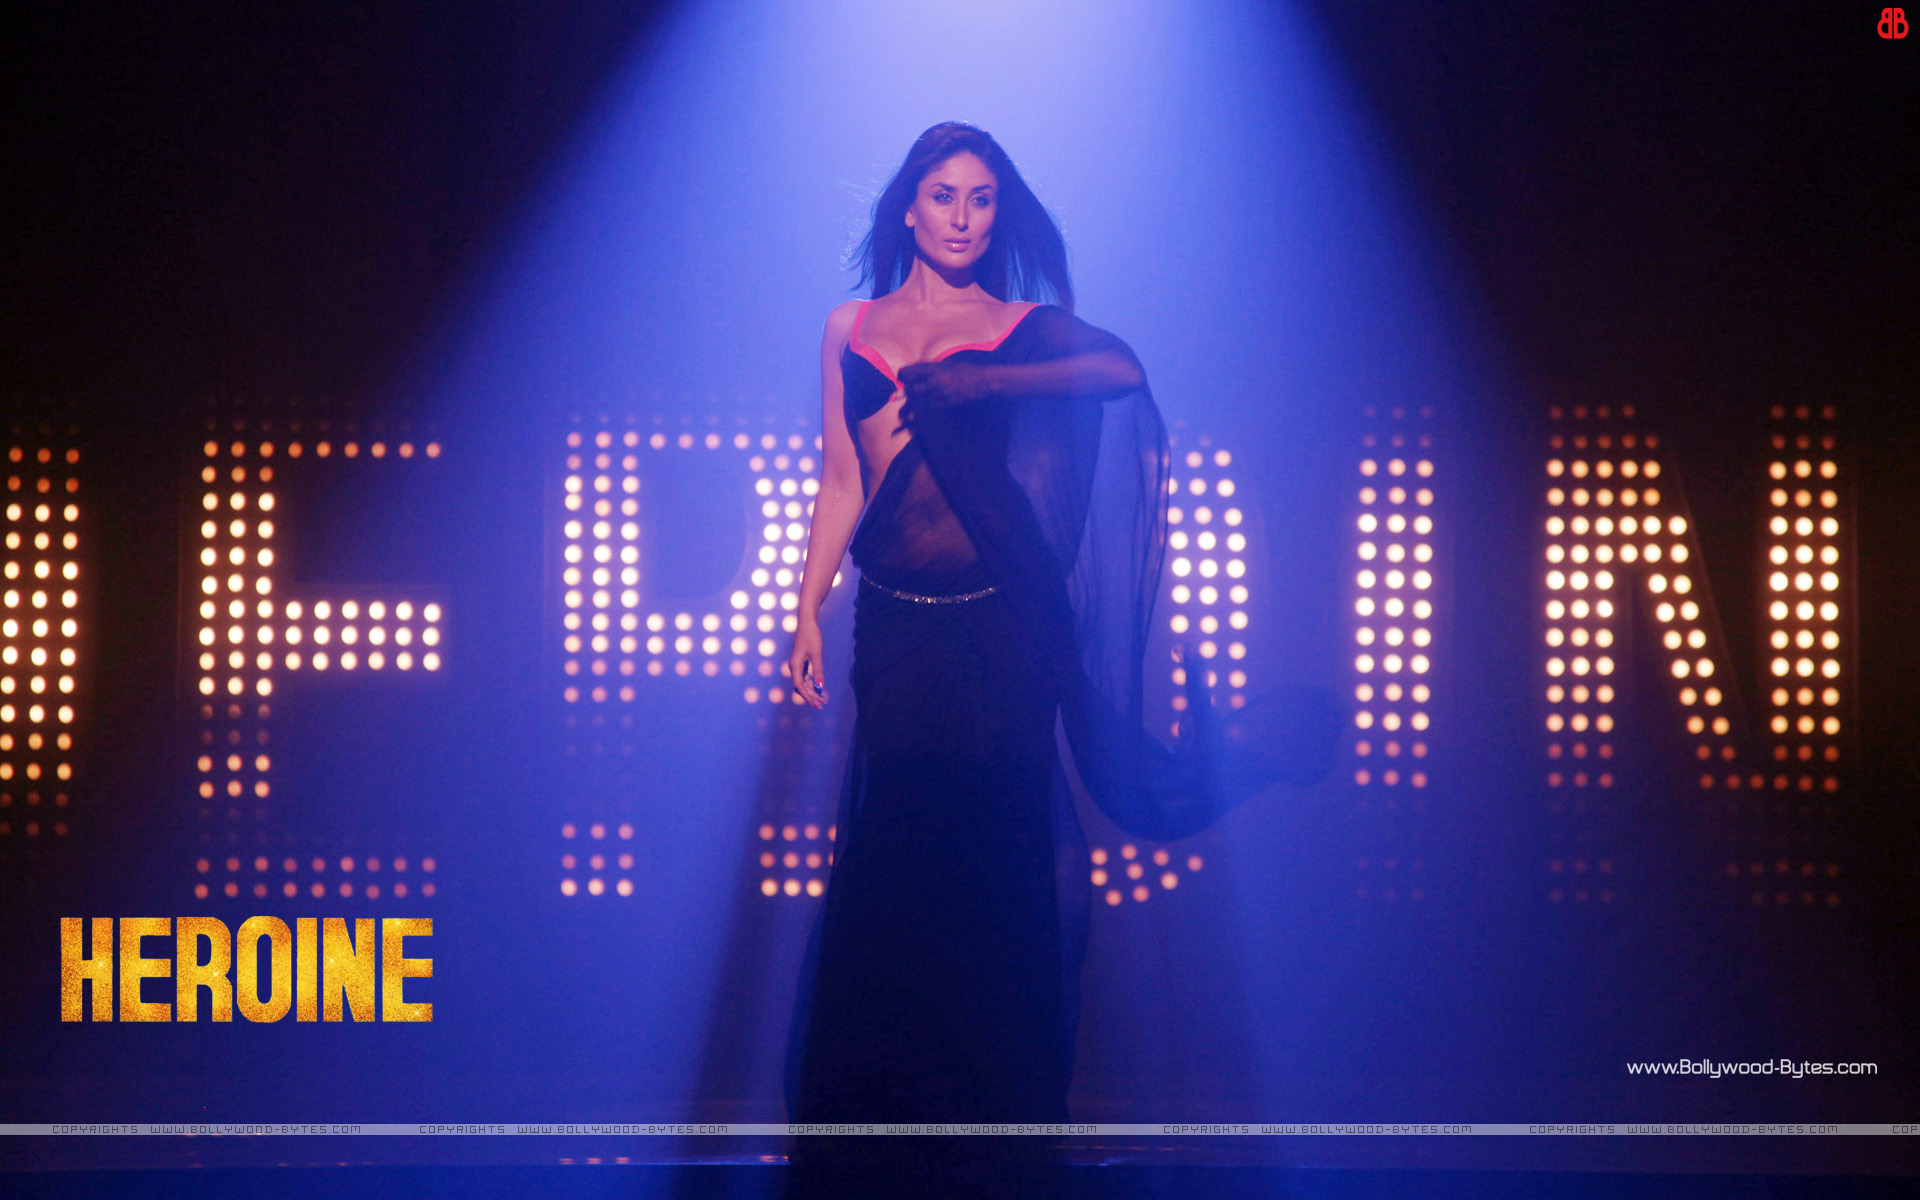 http://3.bp.blogspot.com/-SMqZWDFVSwQ/UFihUSRx7QI/AAAAAAAAPP4/eWyqX_s2wxY/s1920/Heroine-super-Kareena-Kapoor-HD-Wallpaper-11.jpg